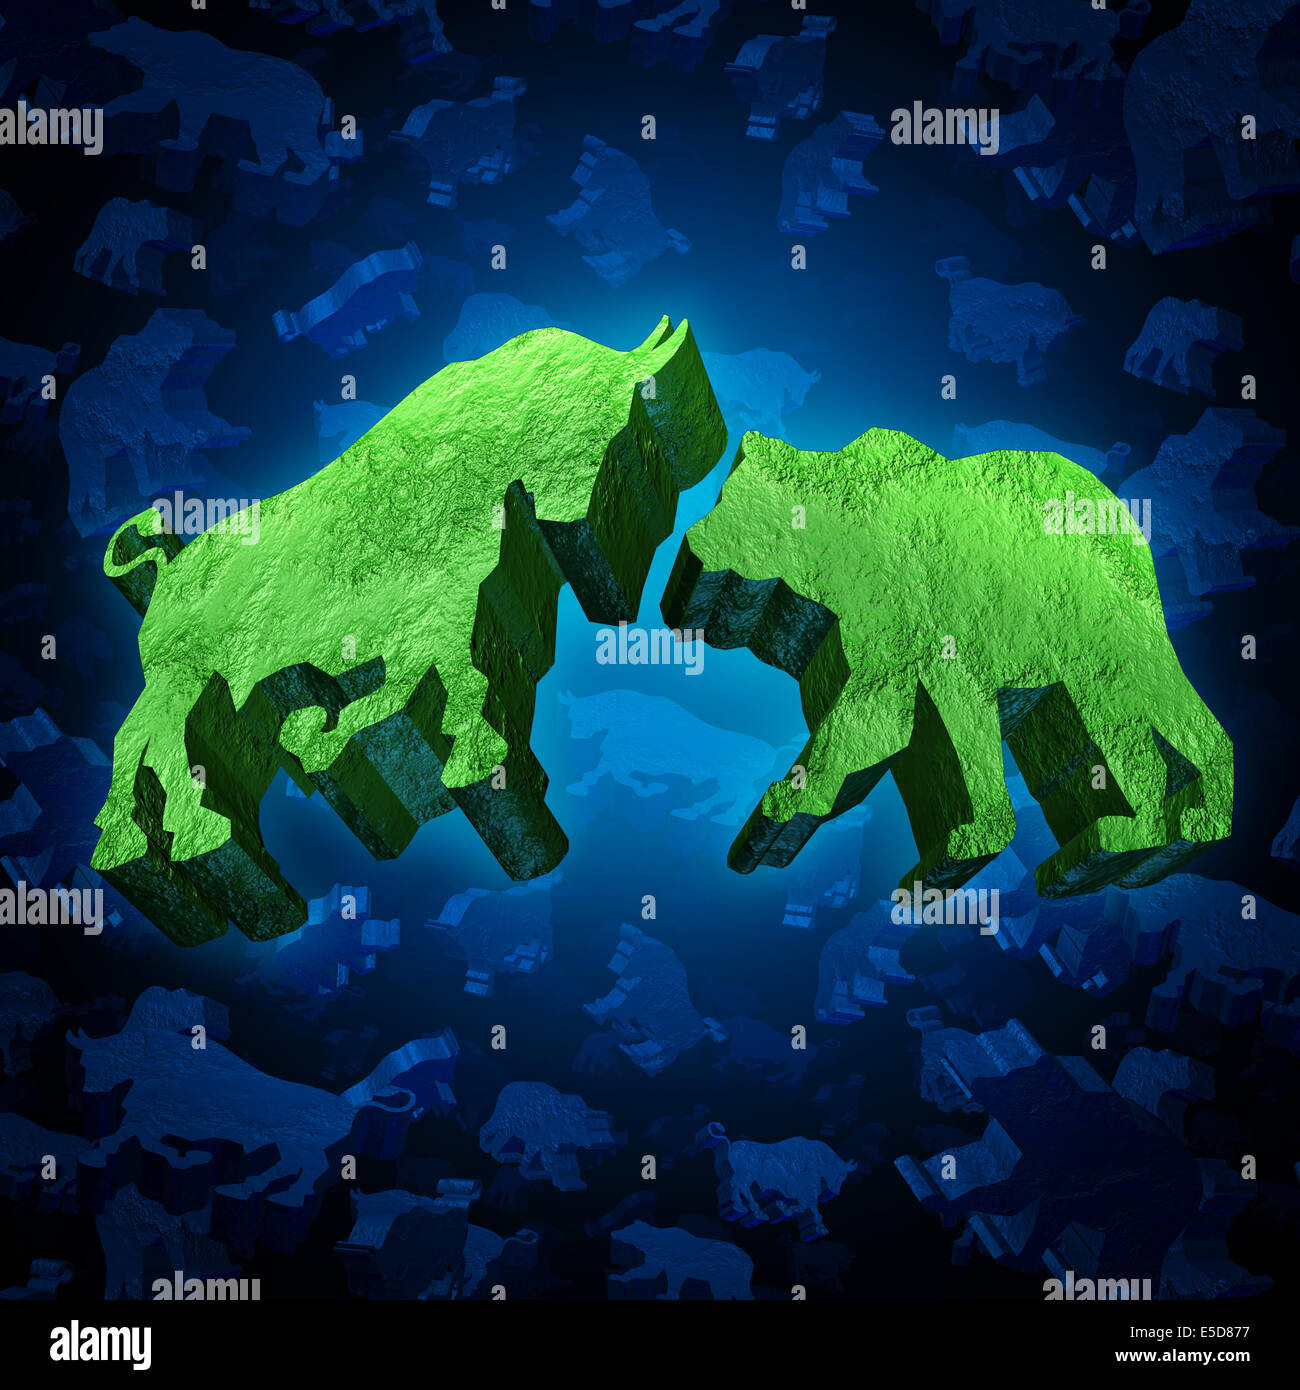 Bolsa invertir bull y bear símbolo como un grupo de tres dimensional trading iconos como un concepto de actividad Imagen De Stock